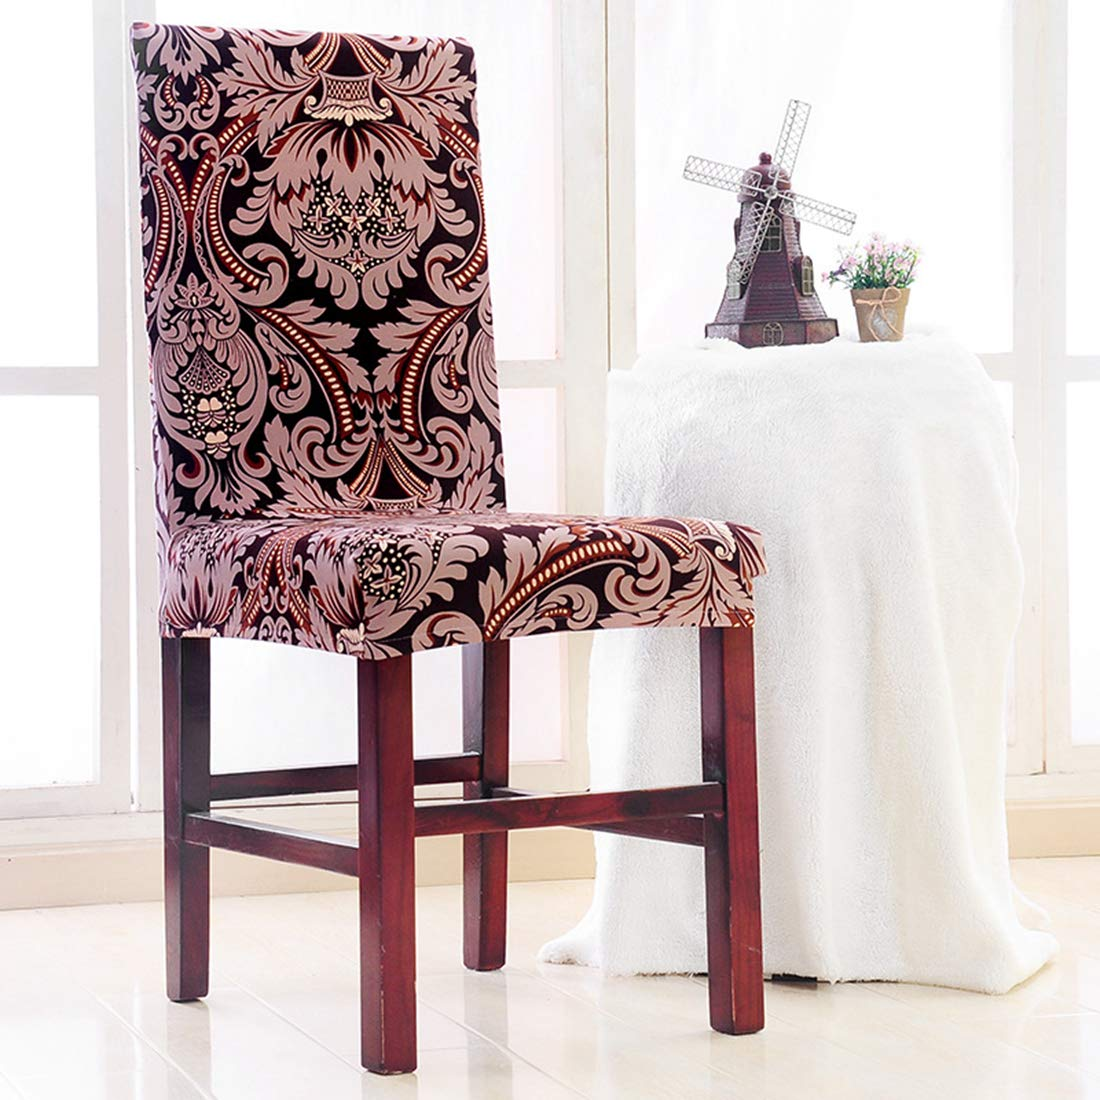 Enjoyable Amazon Com Jonaro 6 Pcs Spandex Chair Cover Floral Pdpeps Interior Chair Design Pdpepsorg